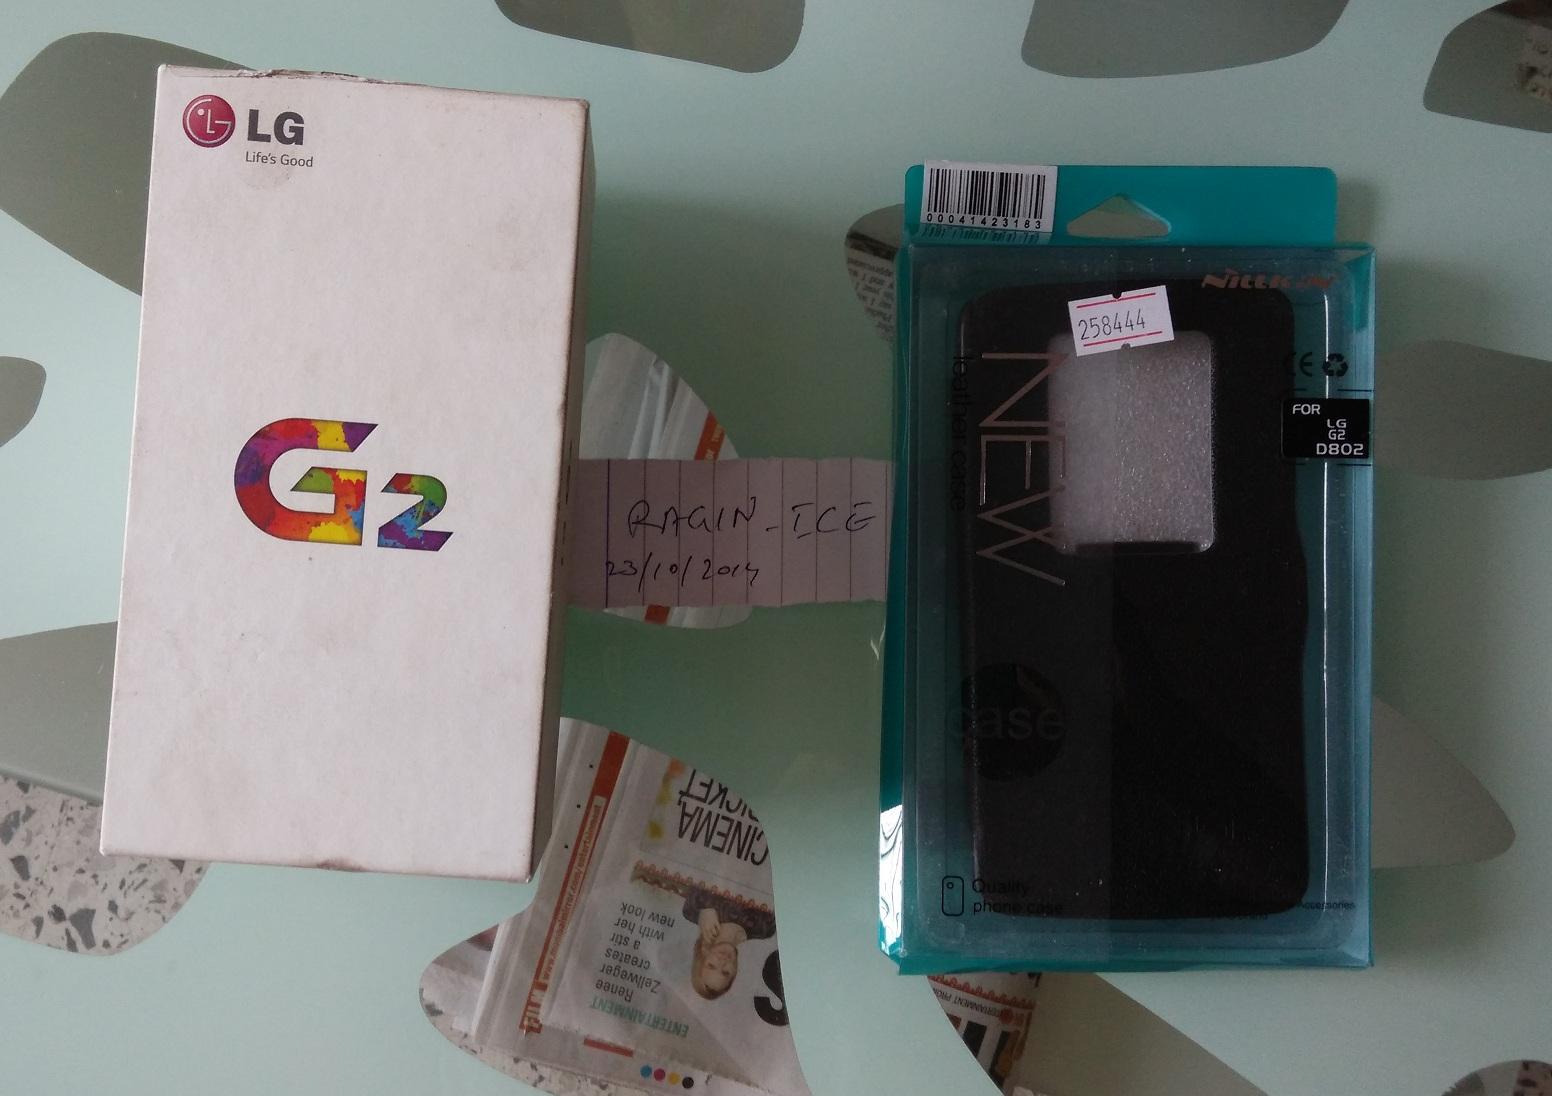 Box and Case G2.jpg